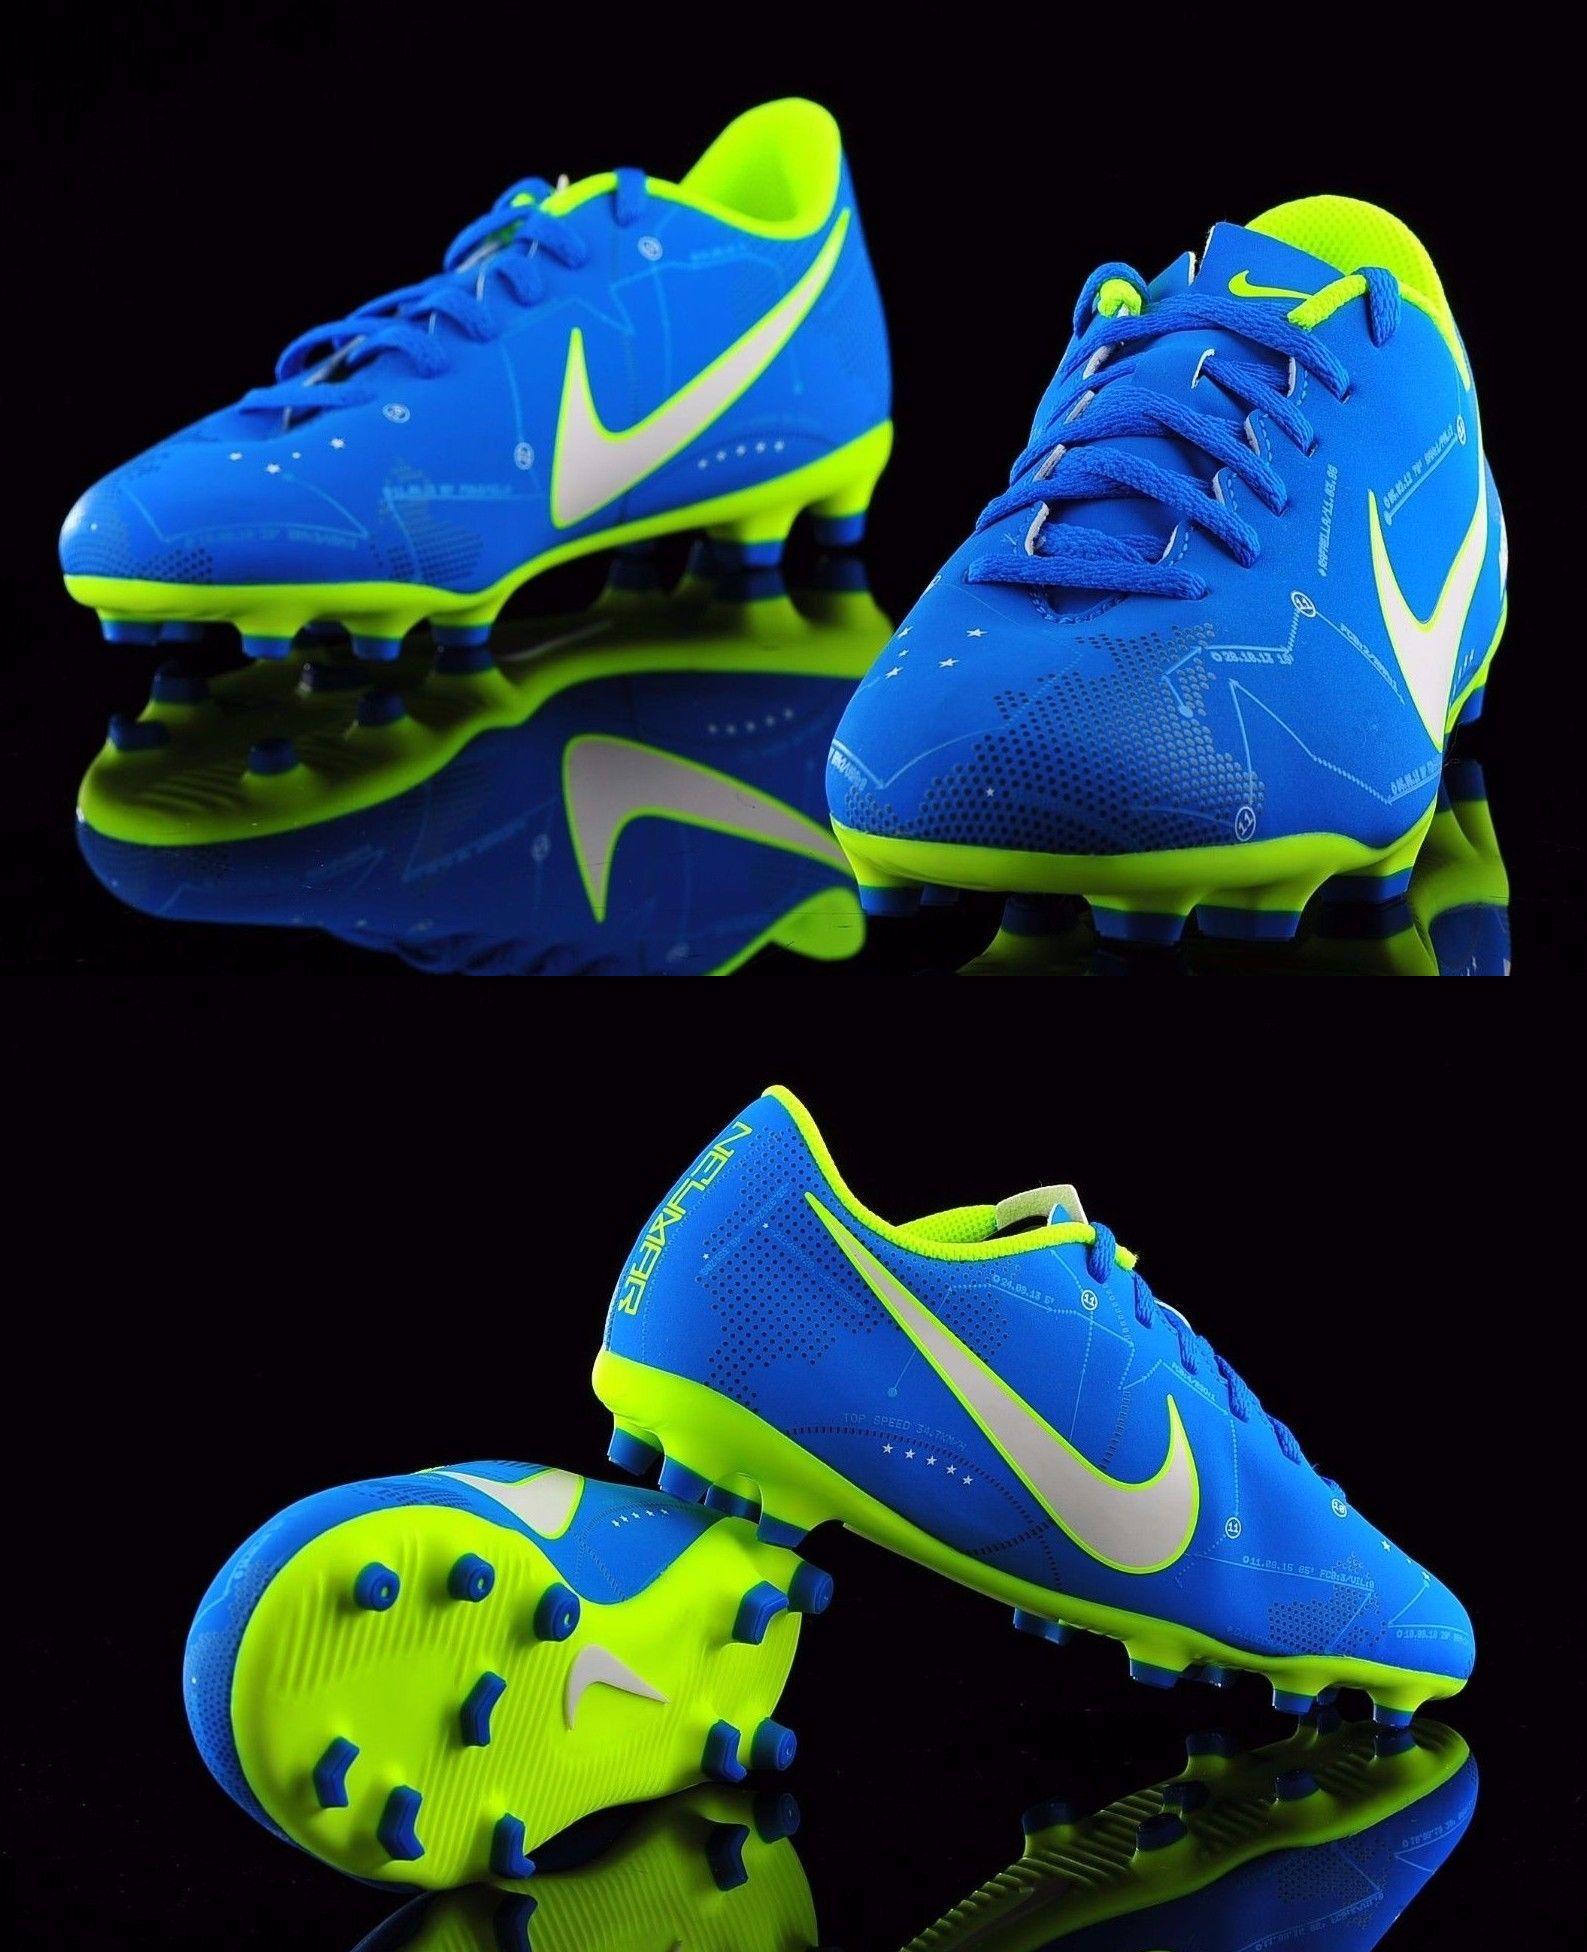 5f1efd59c3d Youth 159177  Nike Junior Mercurial Vortex Iii Njr Fg - Blue Orbit Volt  White -